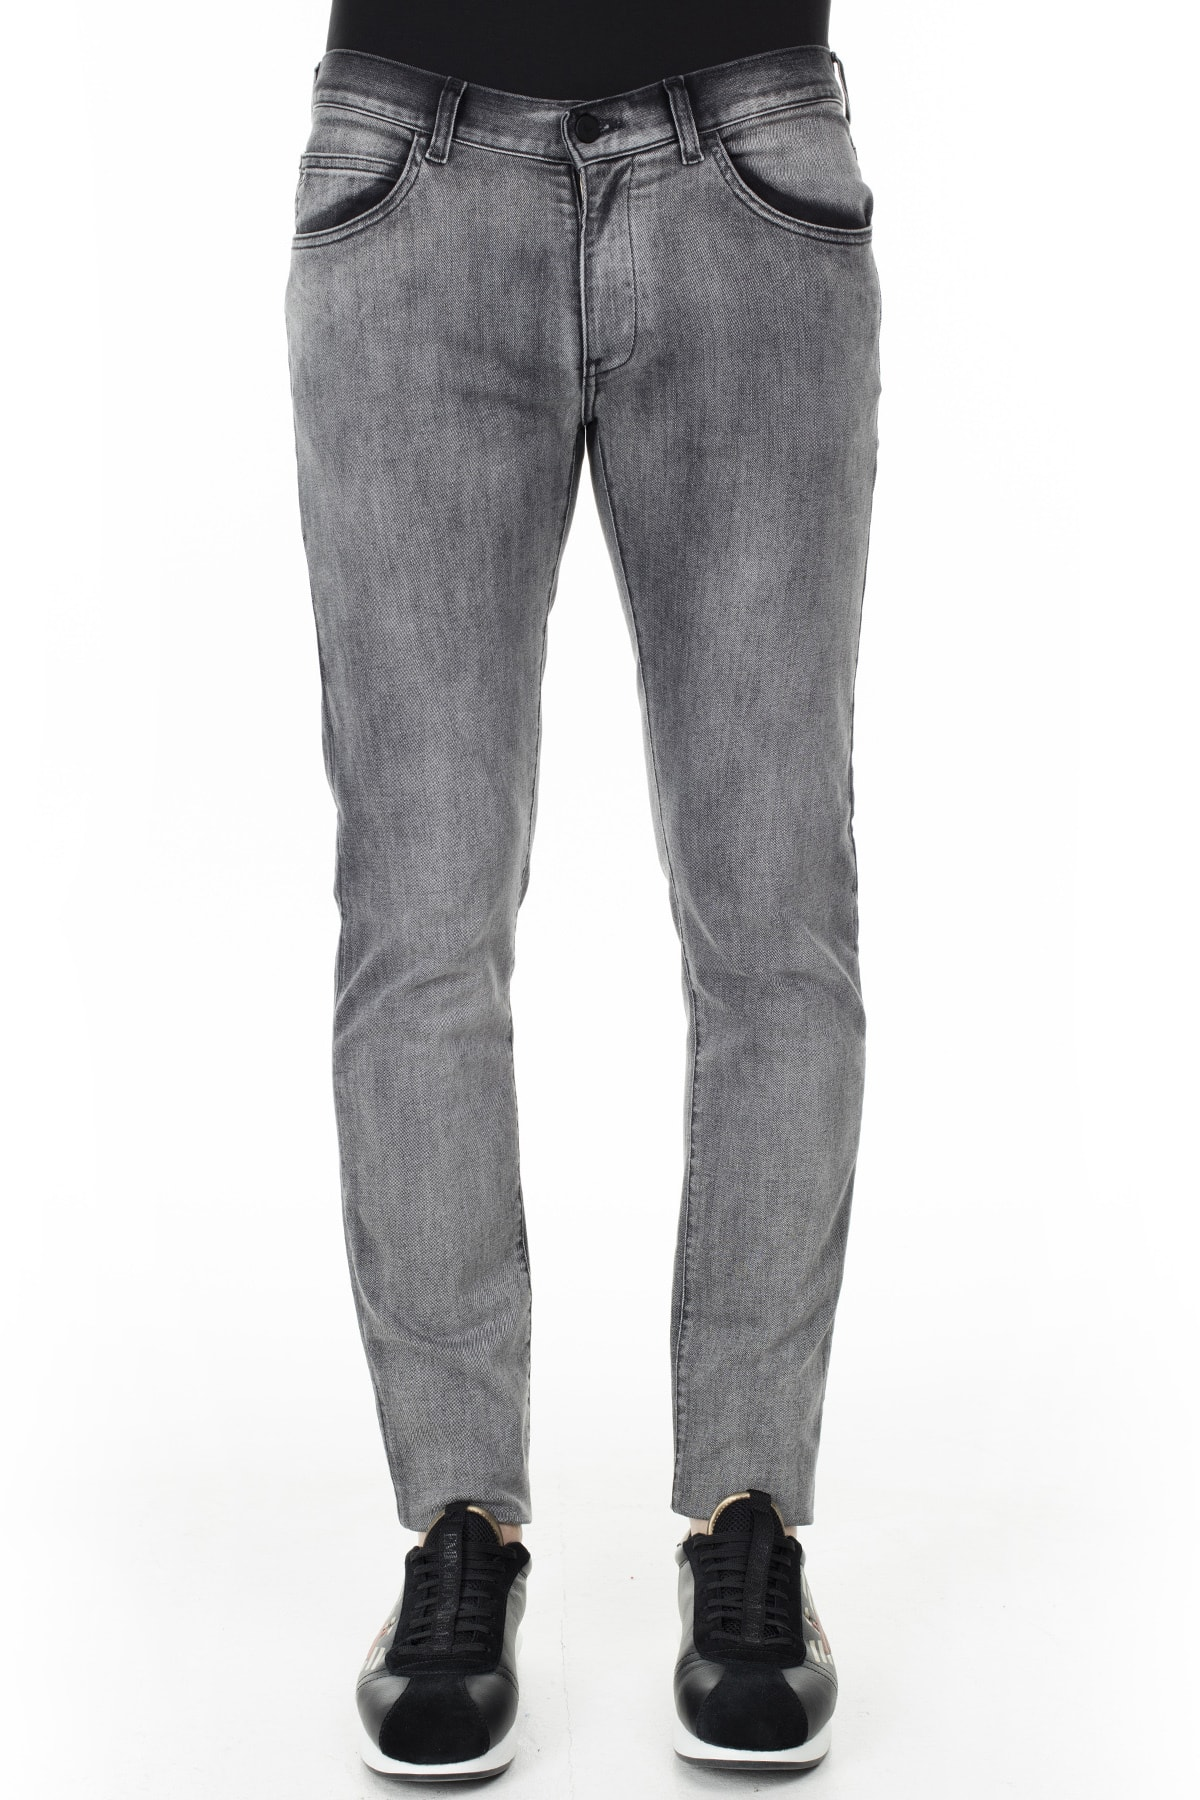 Emporio Armani J10 Jeans Erkek Kot Pantolon S 6G1J10 1D6Mz 0644 S 6G1J10 1D6MZ 0644 1